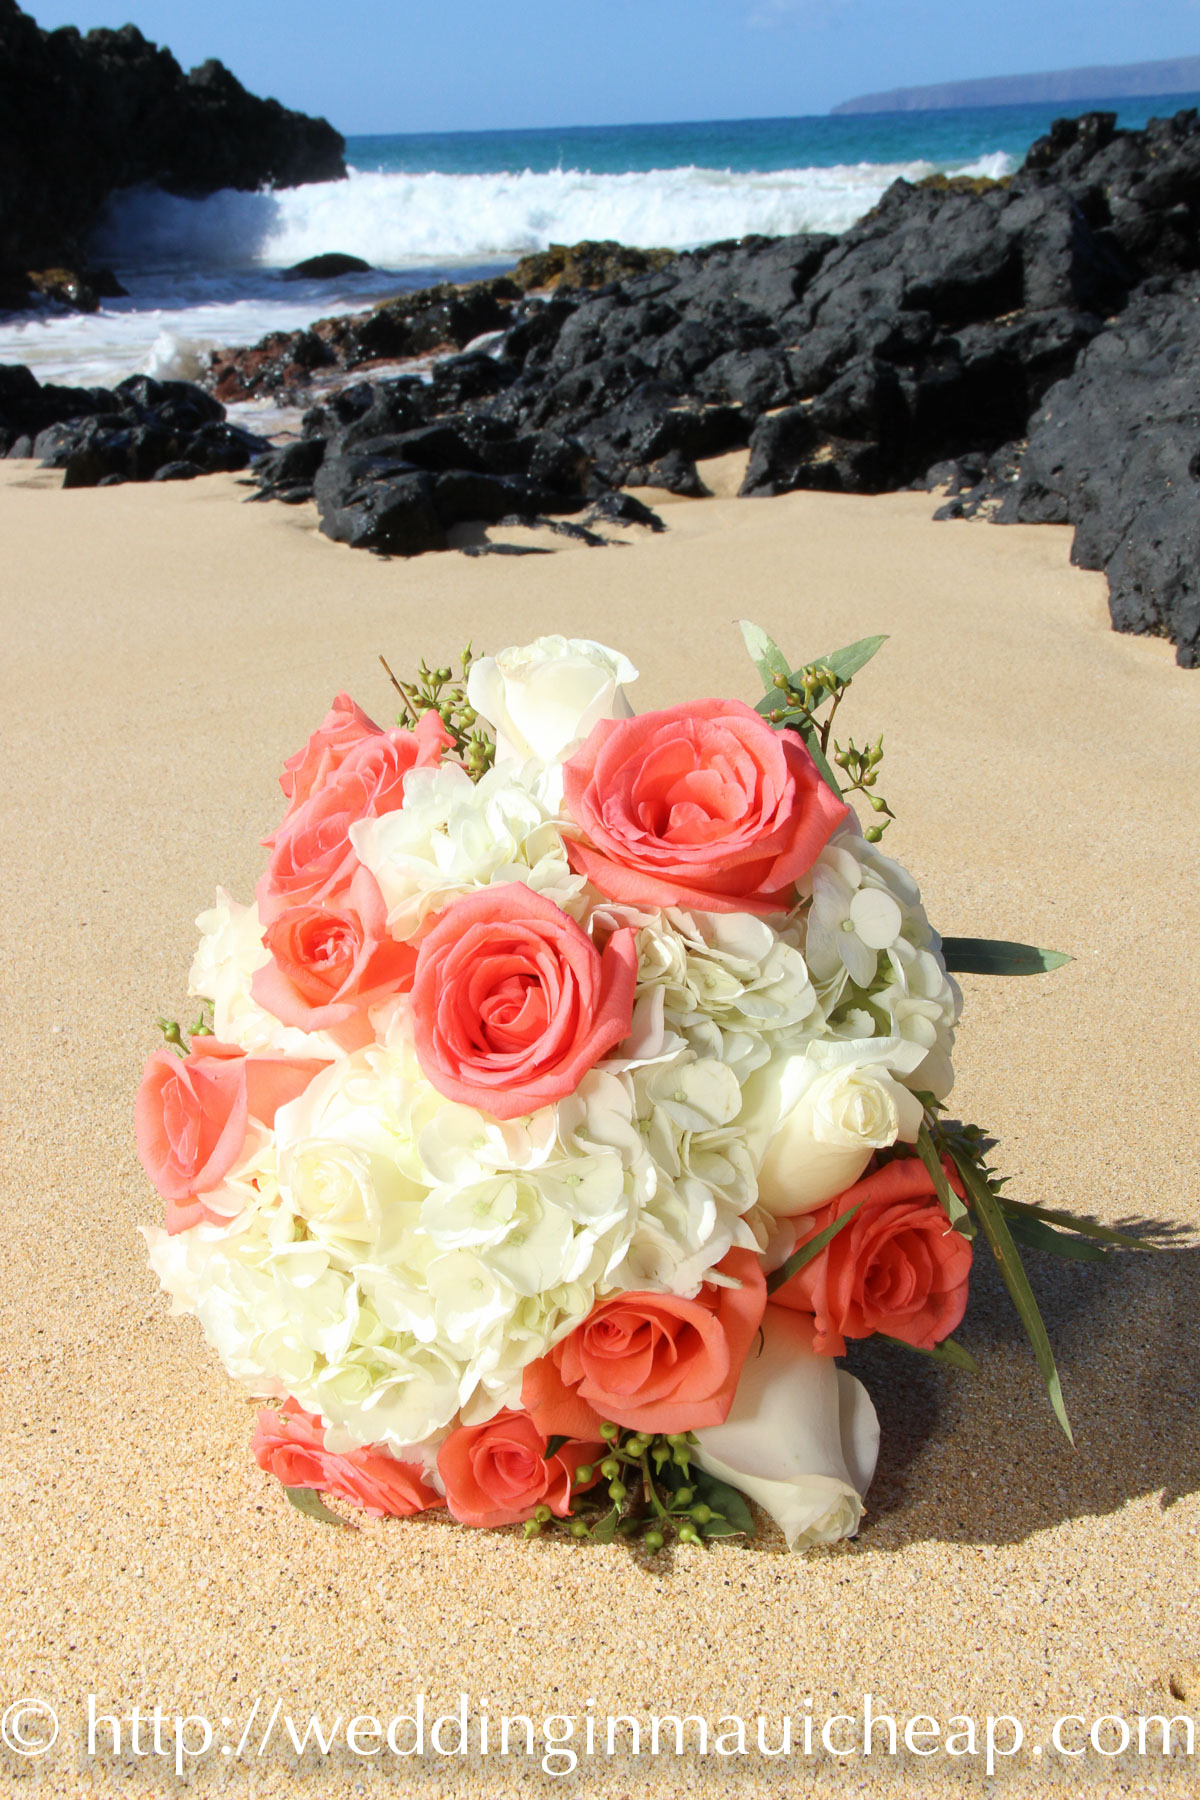 Cheap Maui Wedding Flower Affordable Barefoot Maui Wedding